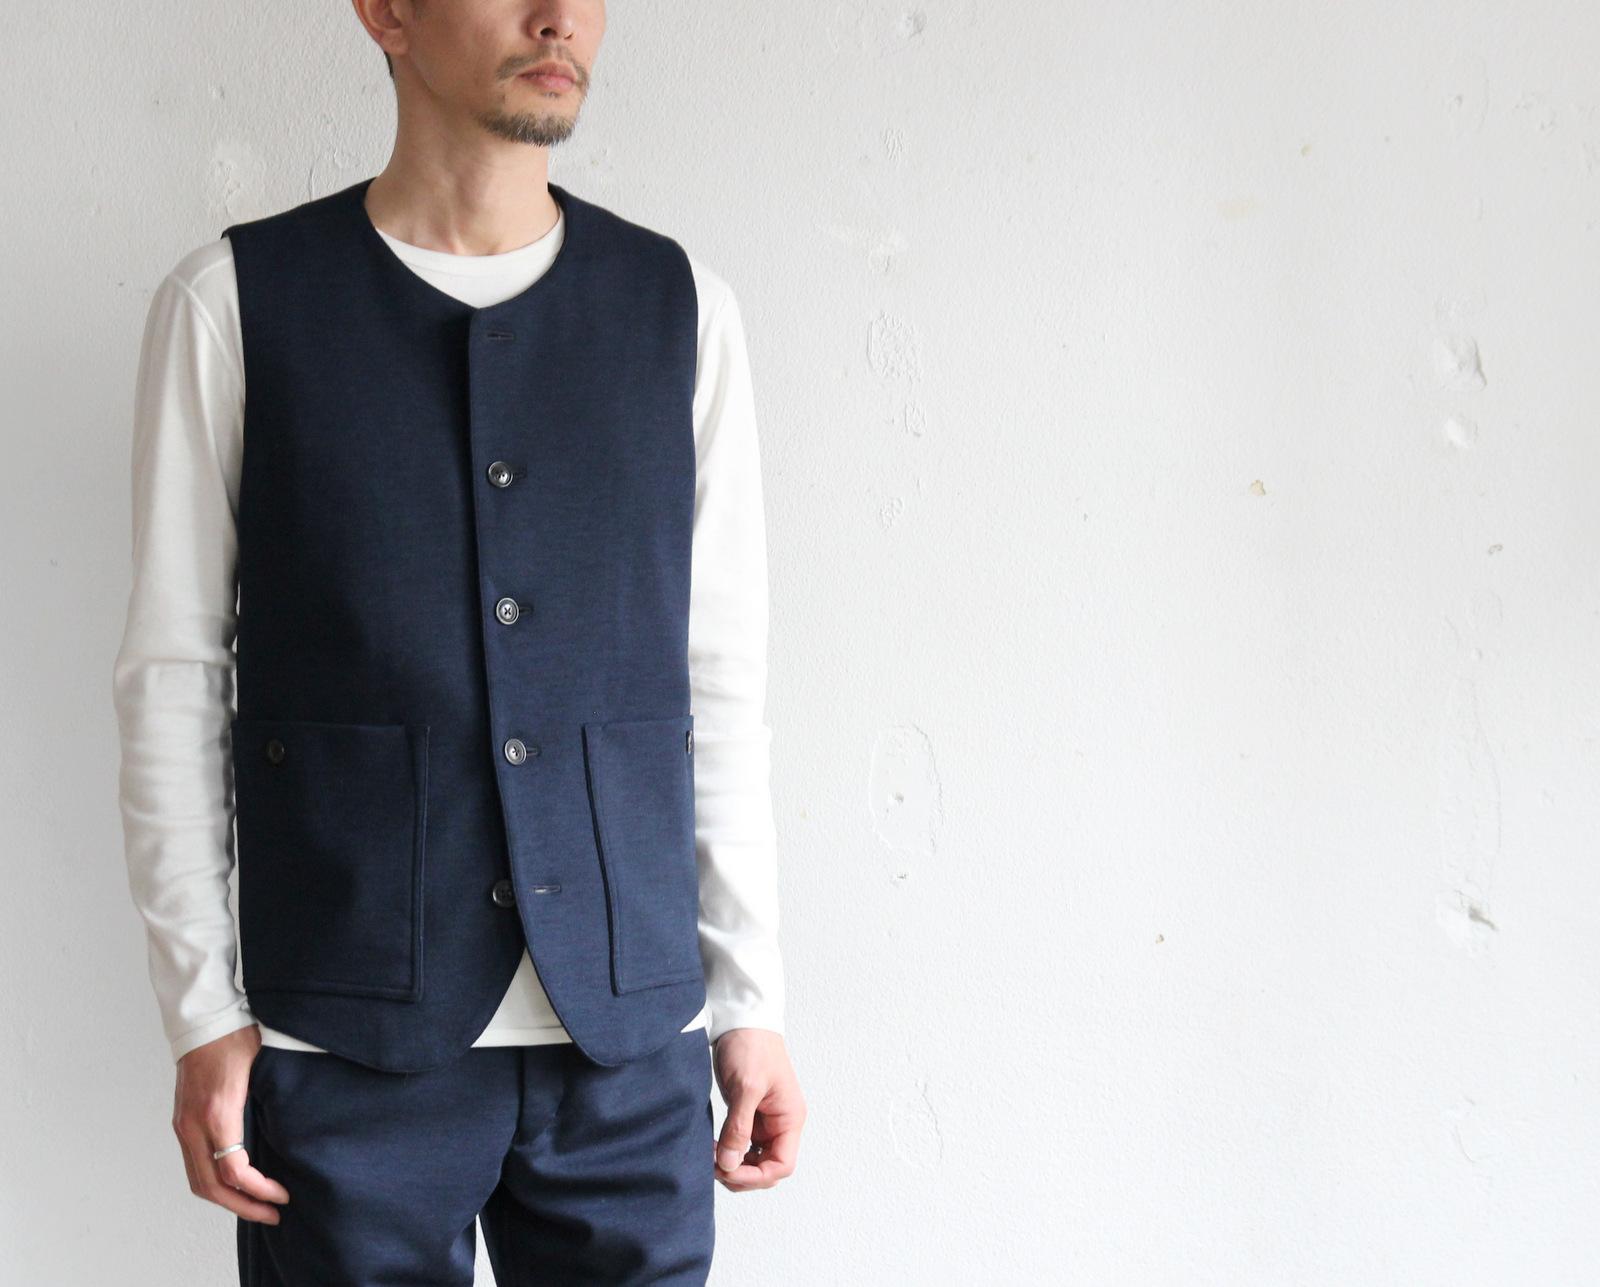 Dress Wool Knit Tailor Vest_c0379477_20103730.jpg